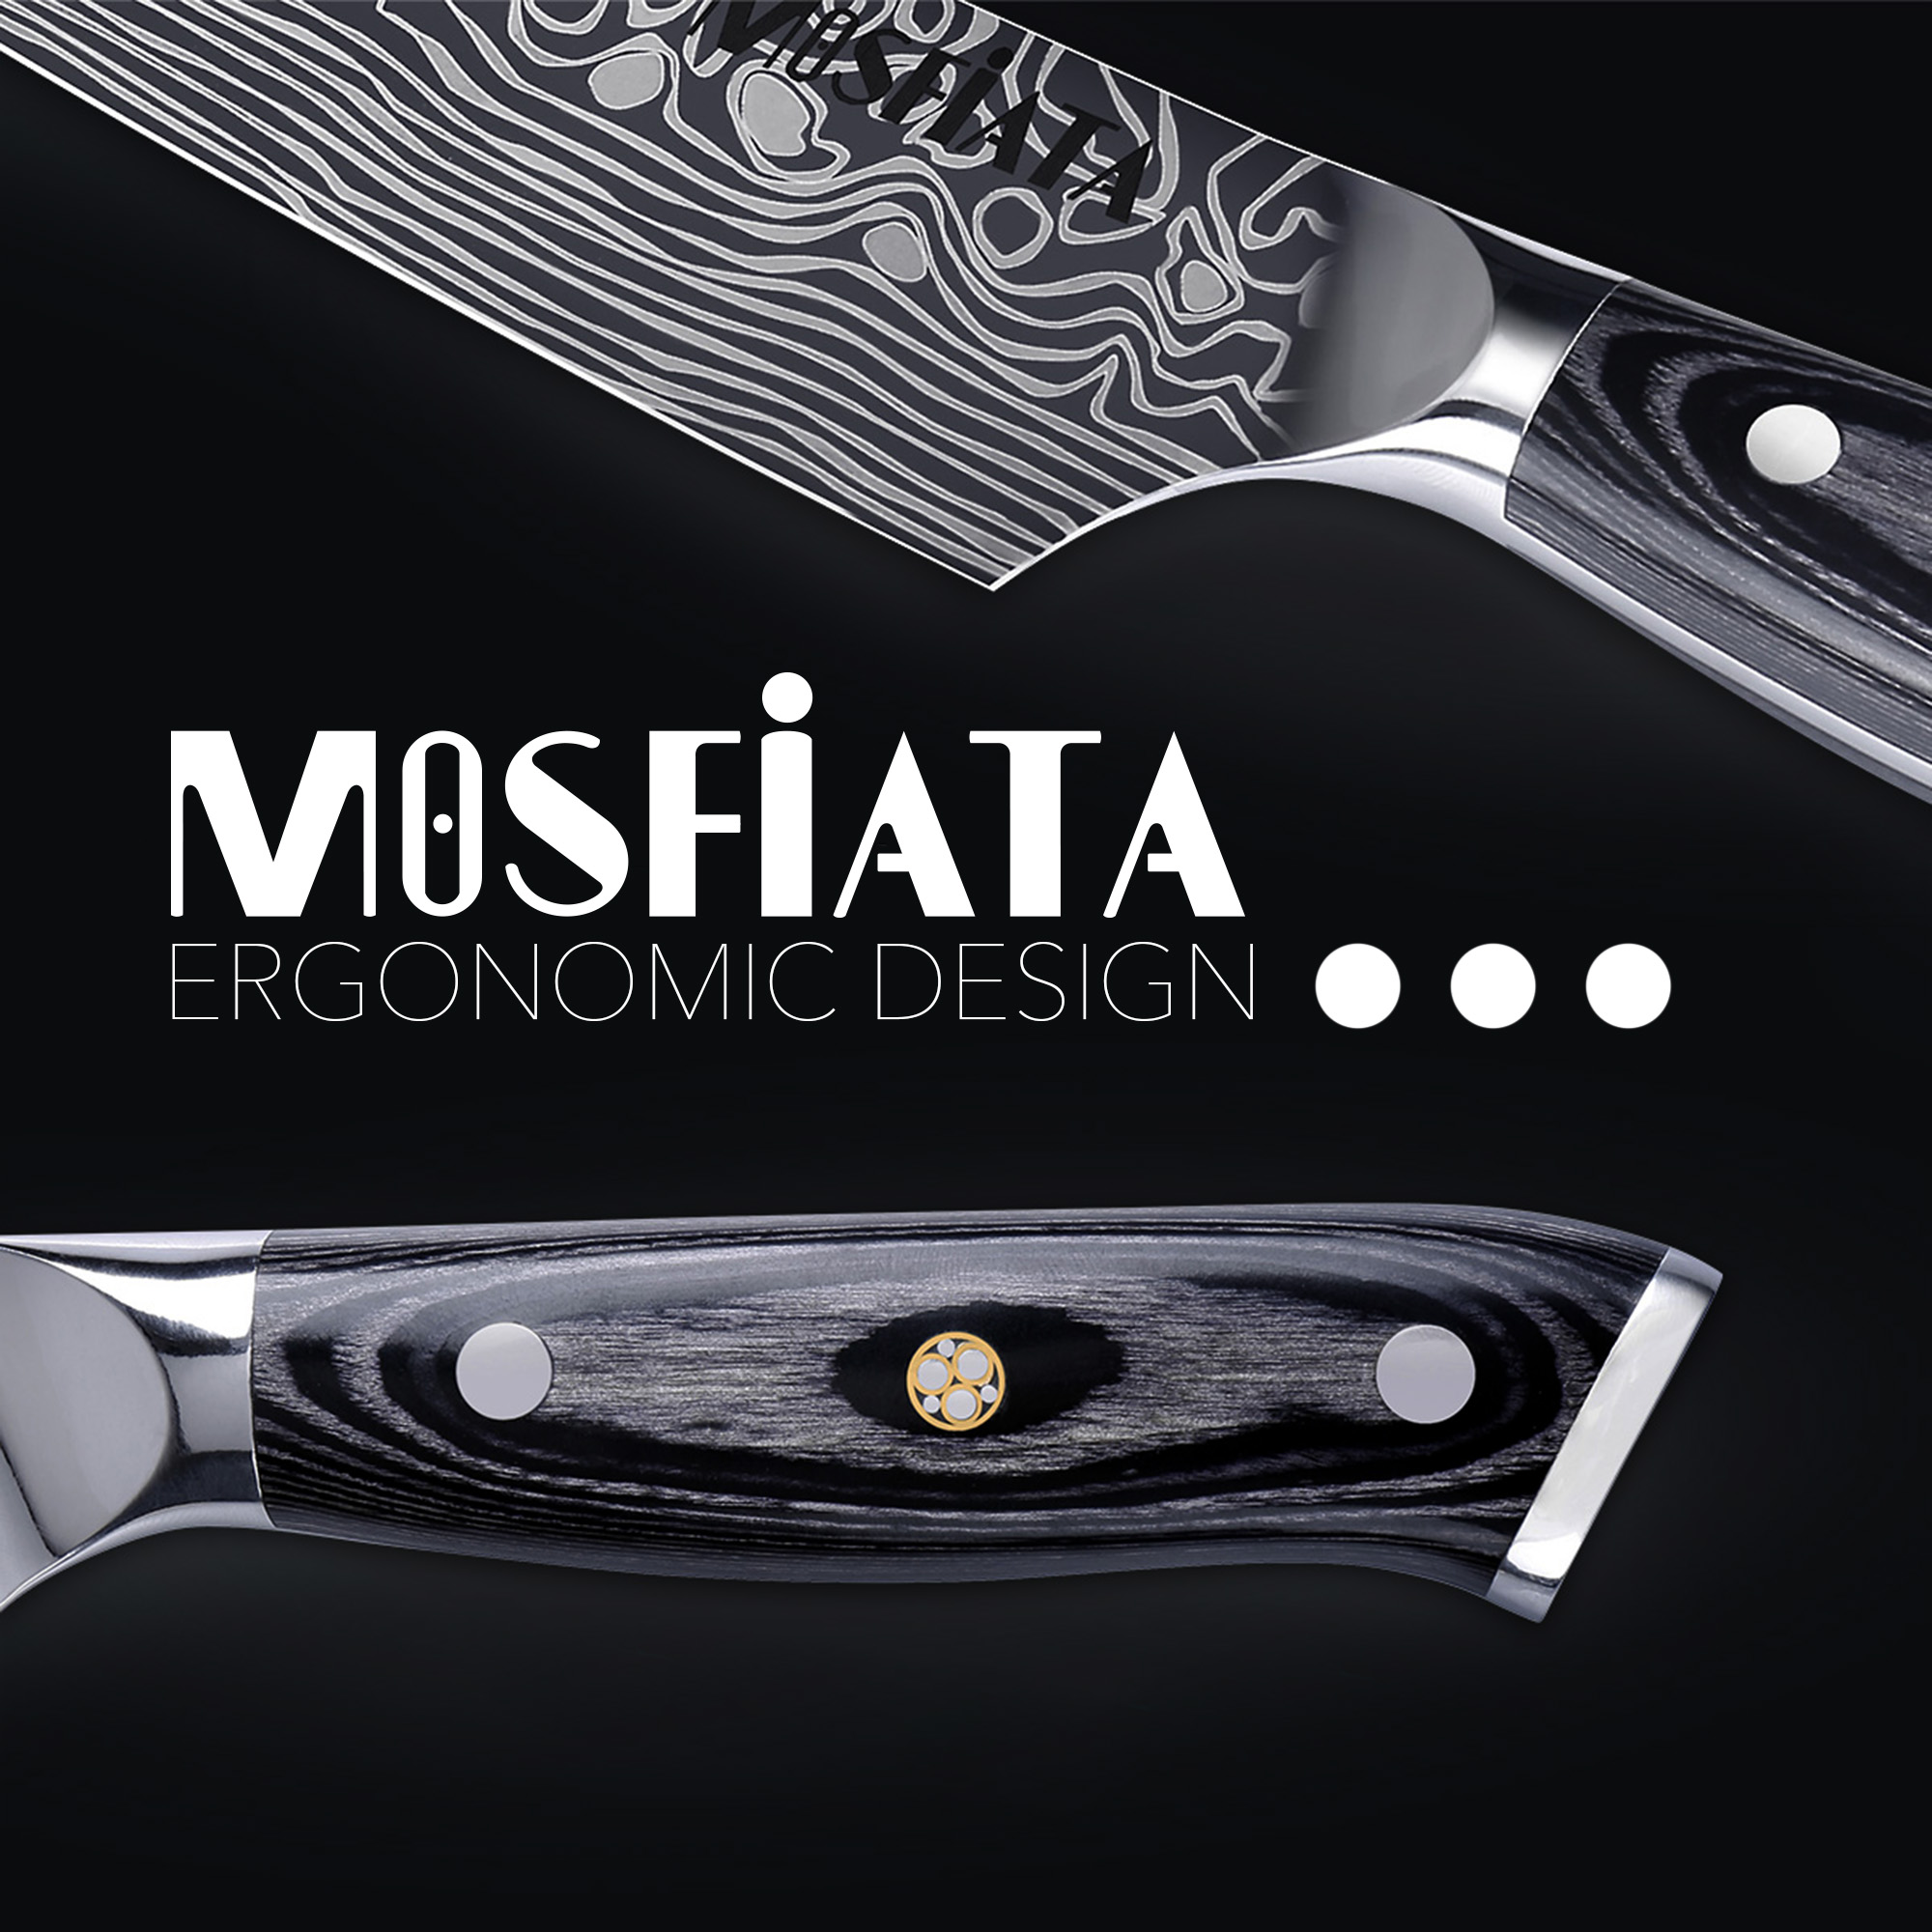 mosfiata knife 08.jpg